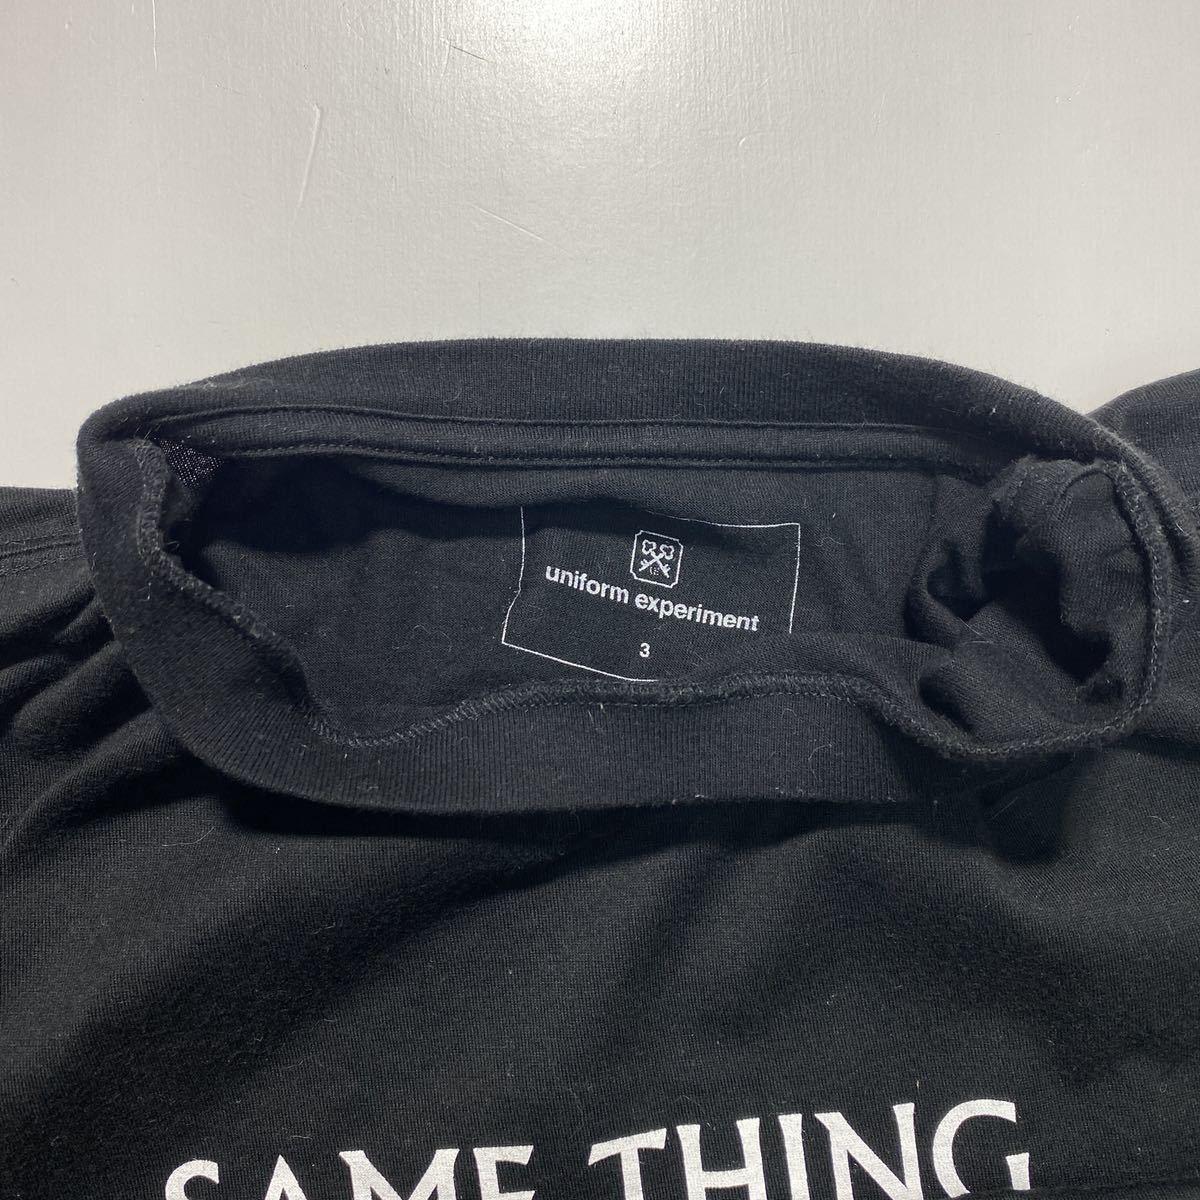 【3】uniform experiment Fragment design Tee ユニフォーム エクスペリメント フラグメントデザイン Tシャツ ブラック G485_画像4